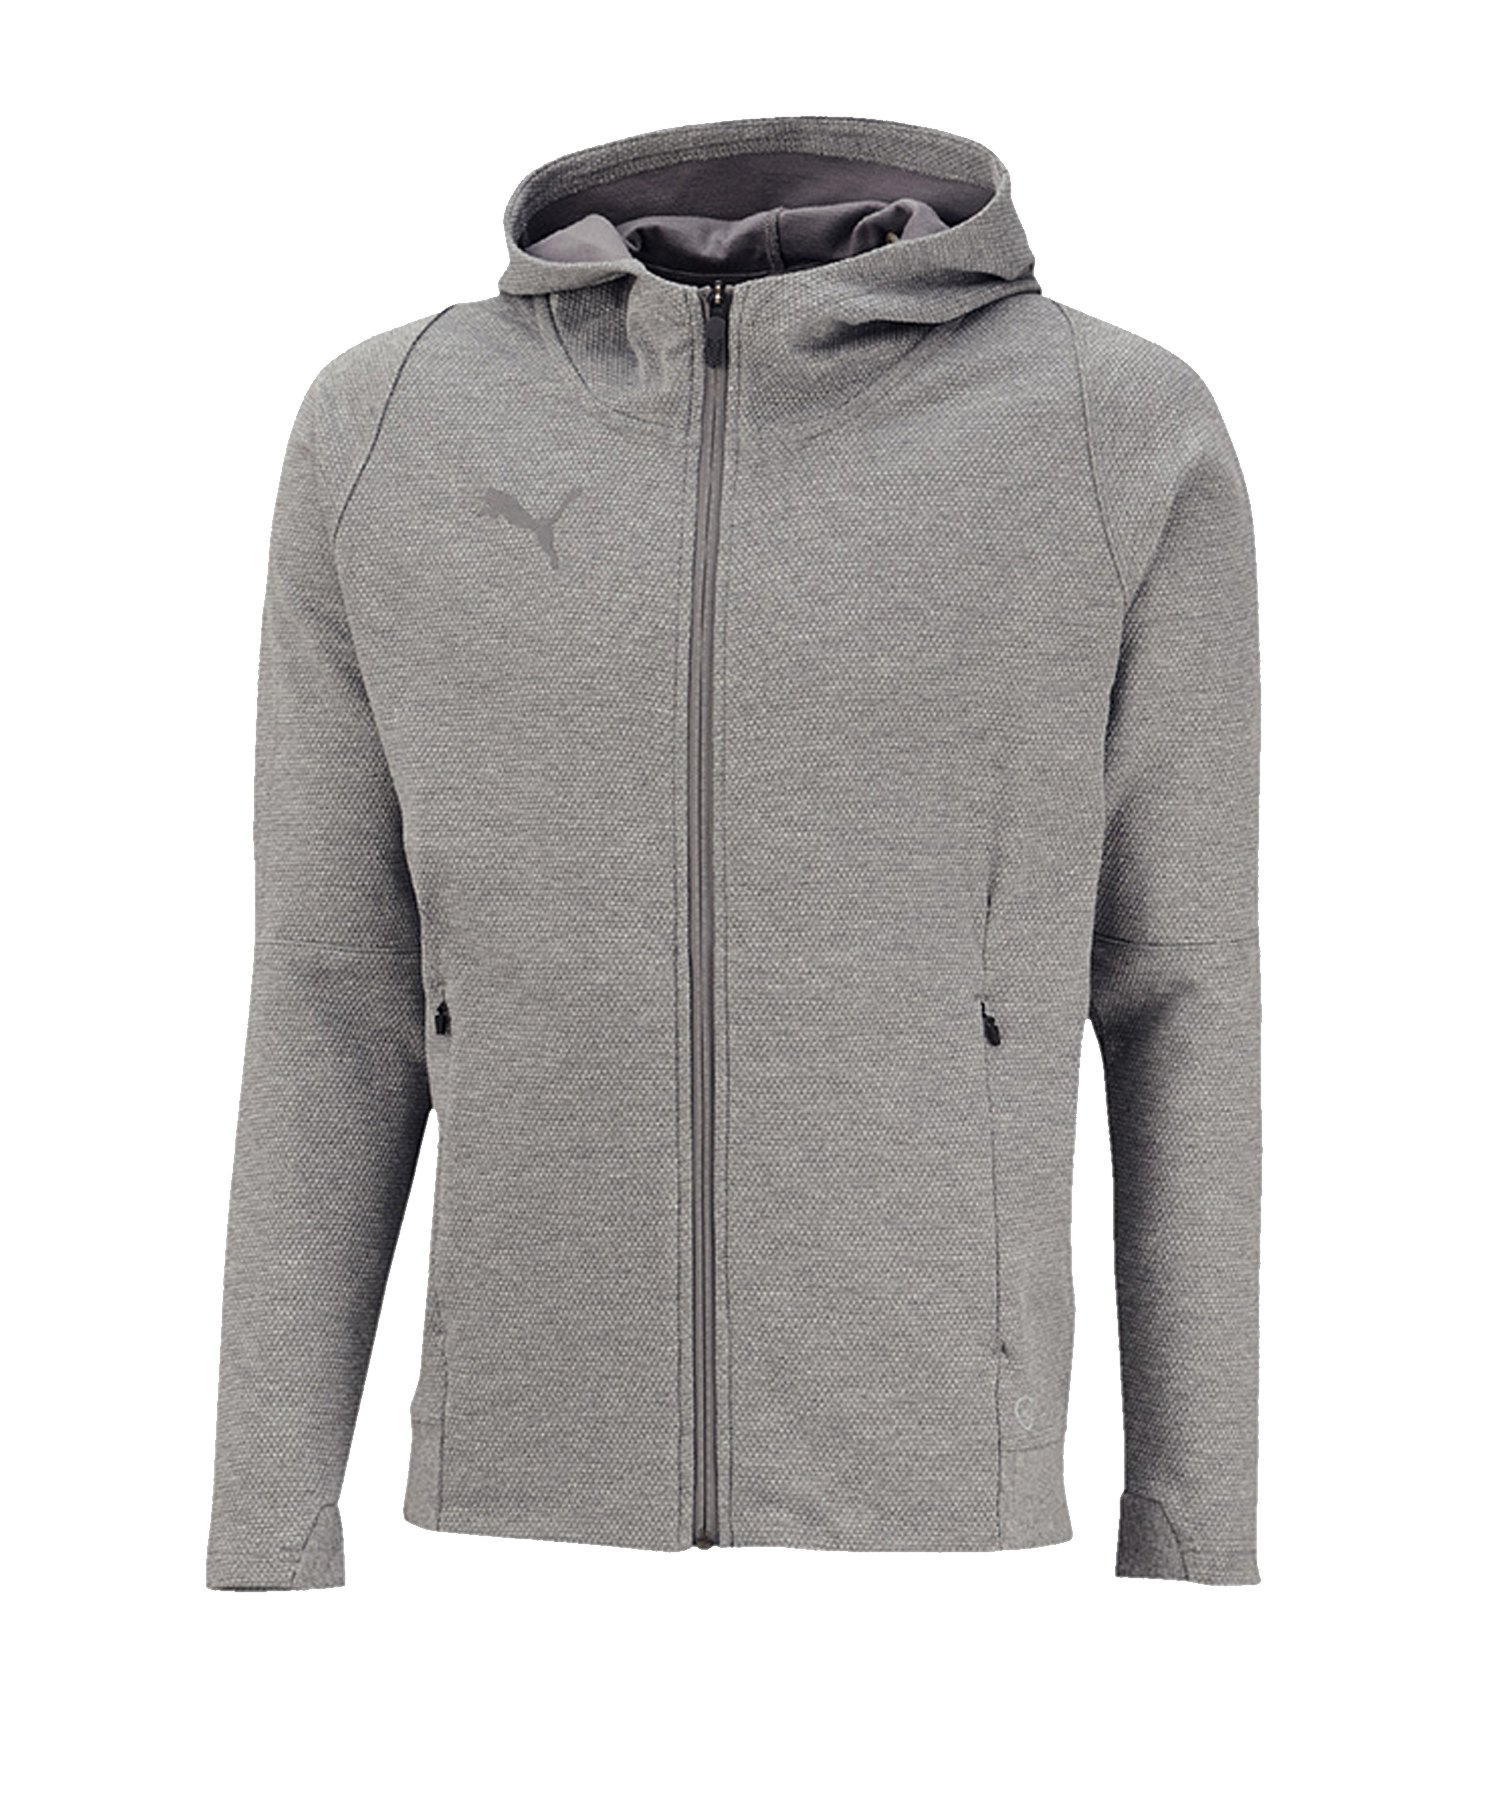 PUMA FINAL Casuals Hooded jacke Grau F37 - grau